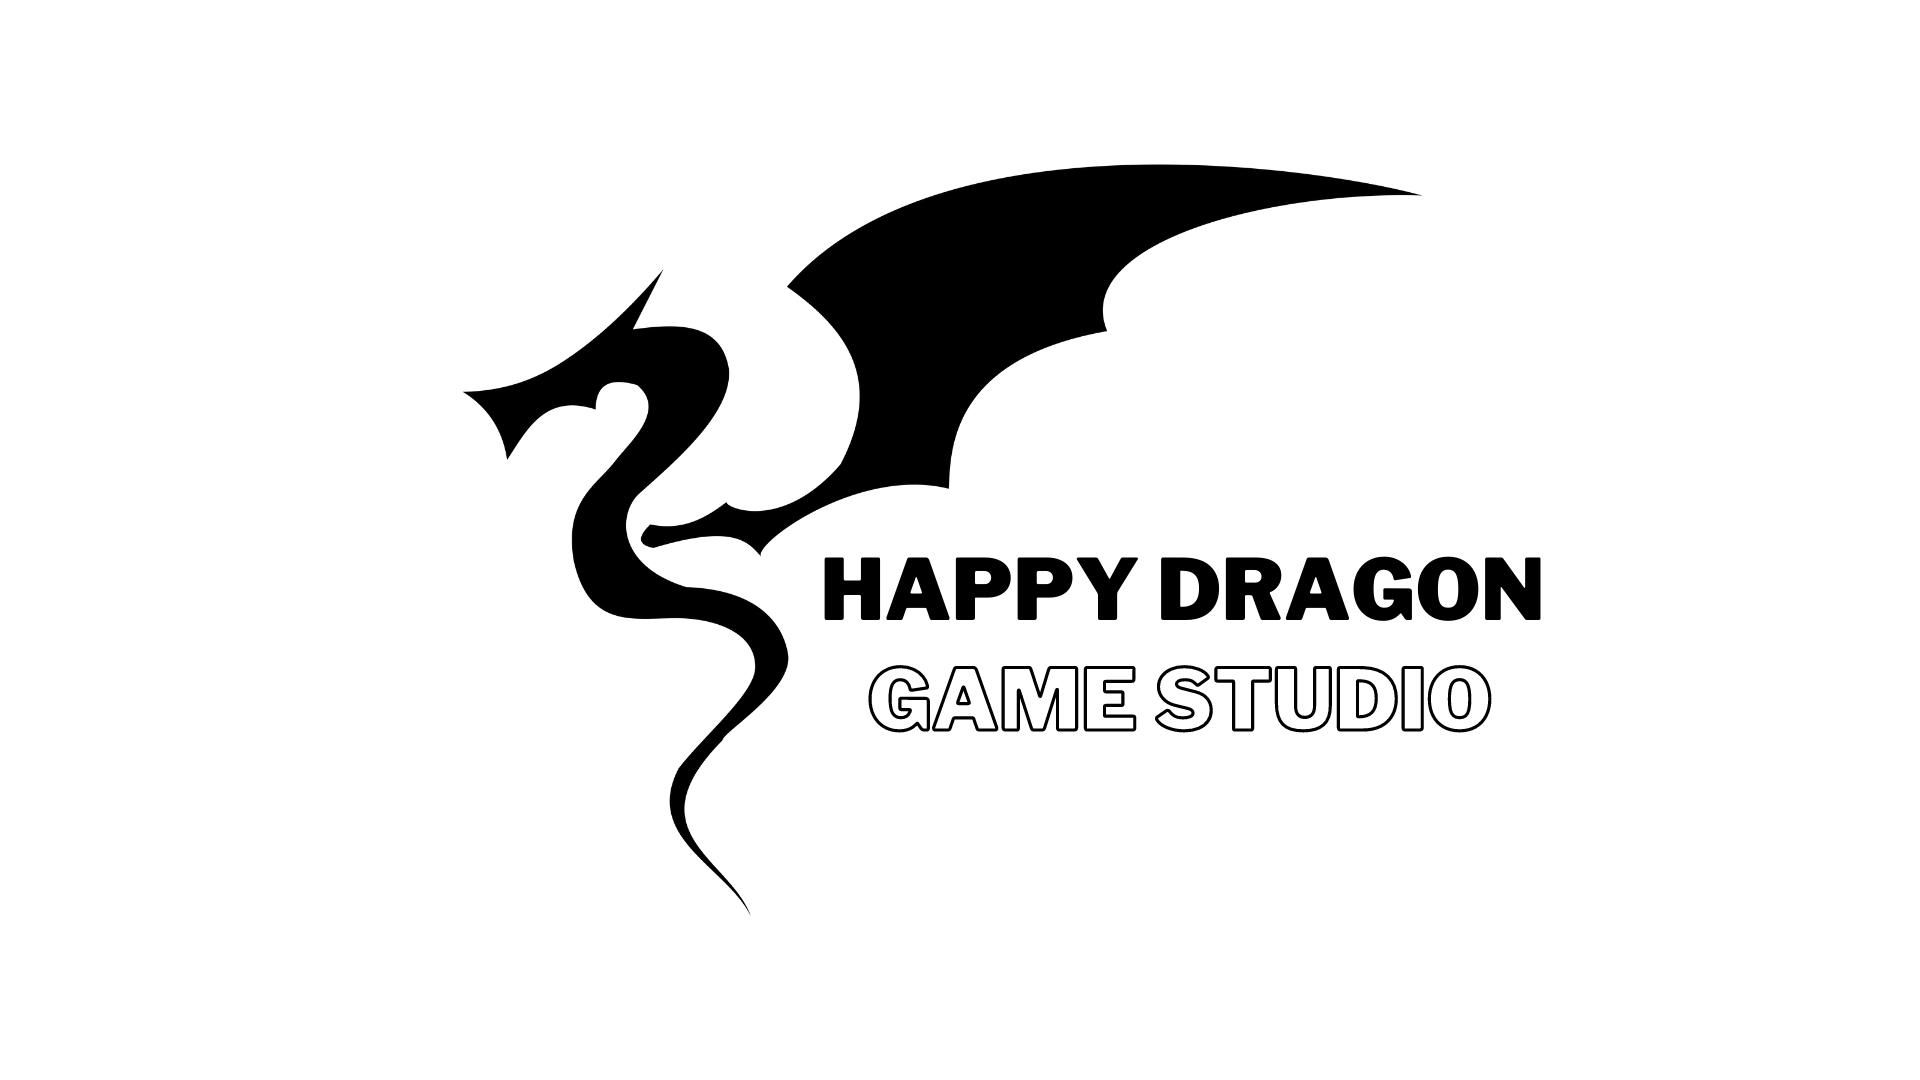 Happy Dragon Game Studio